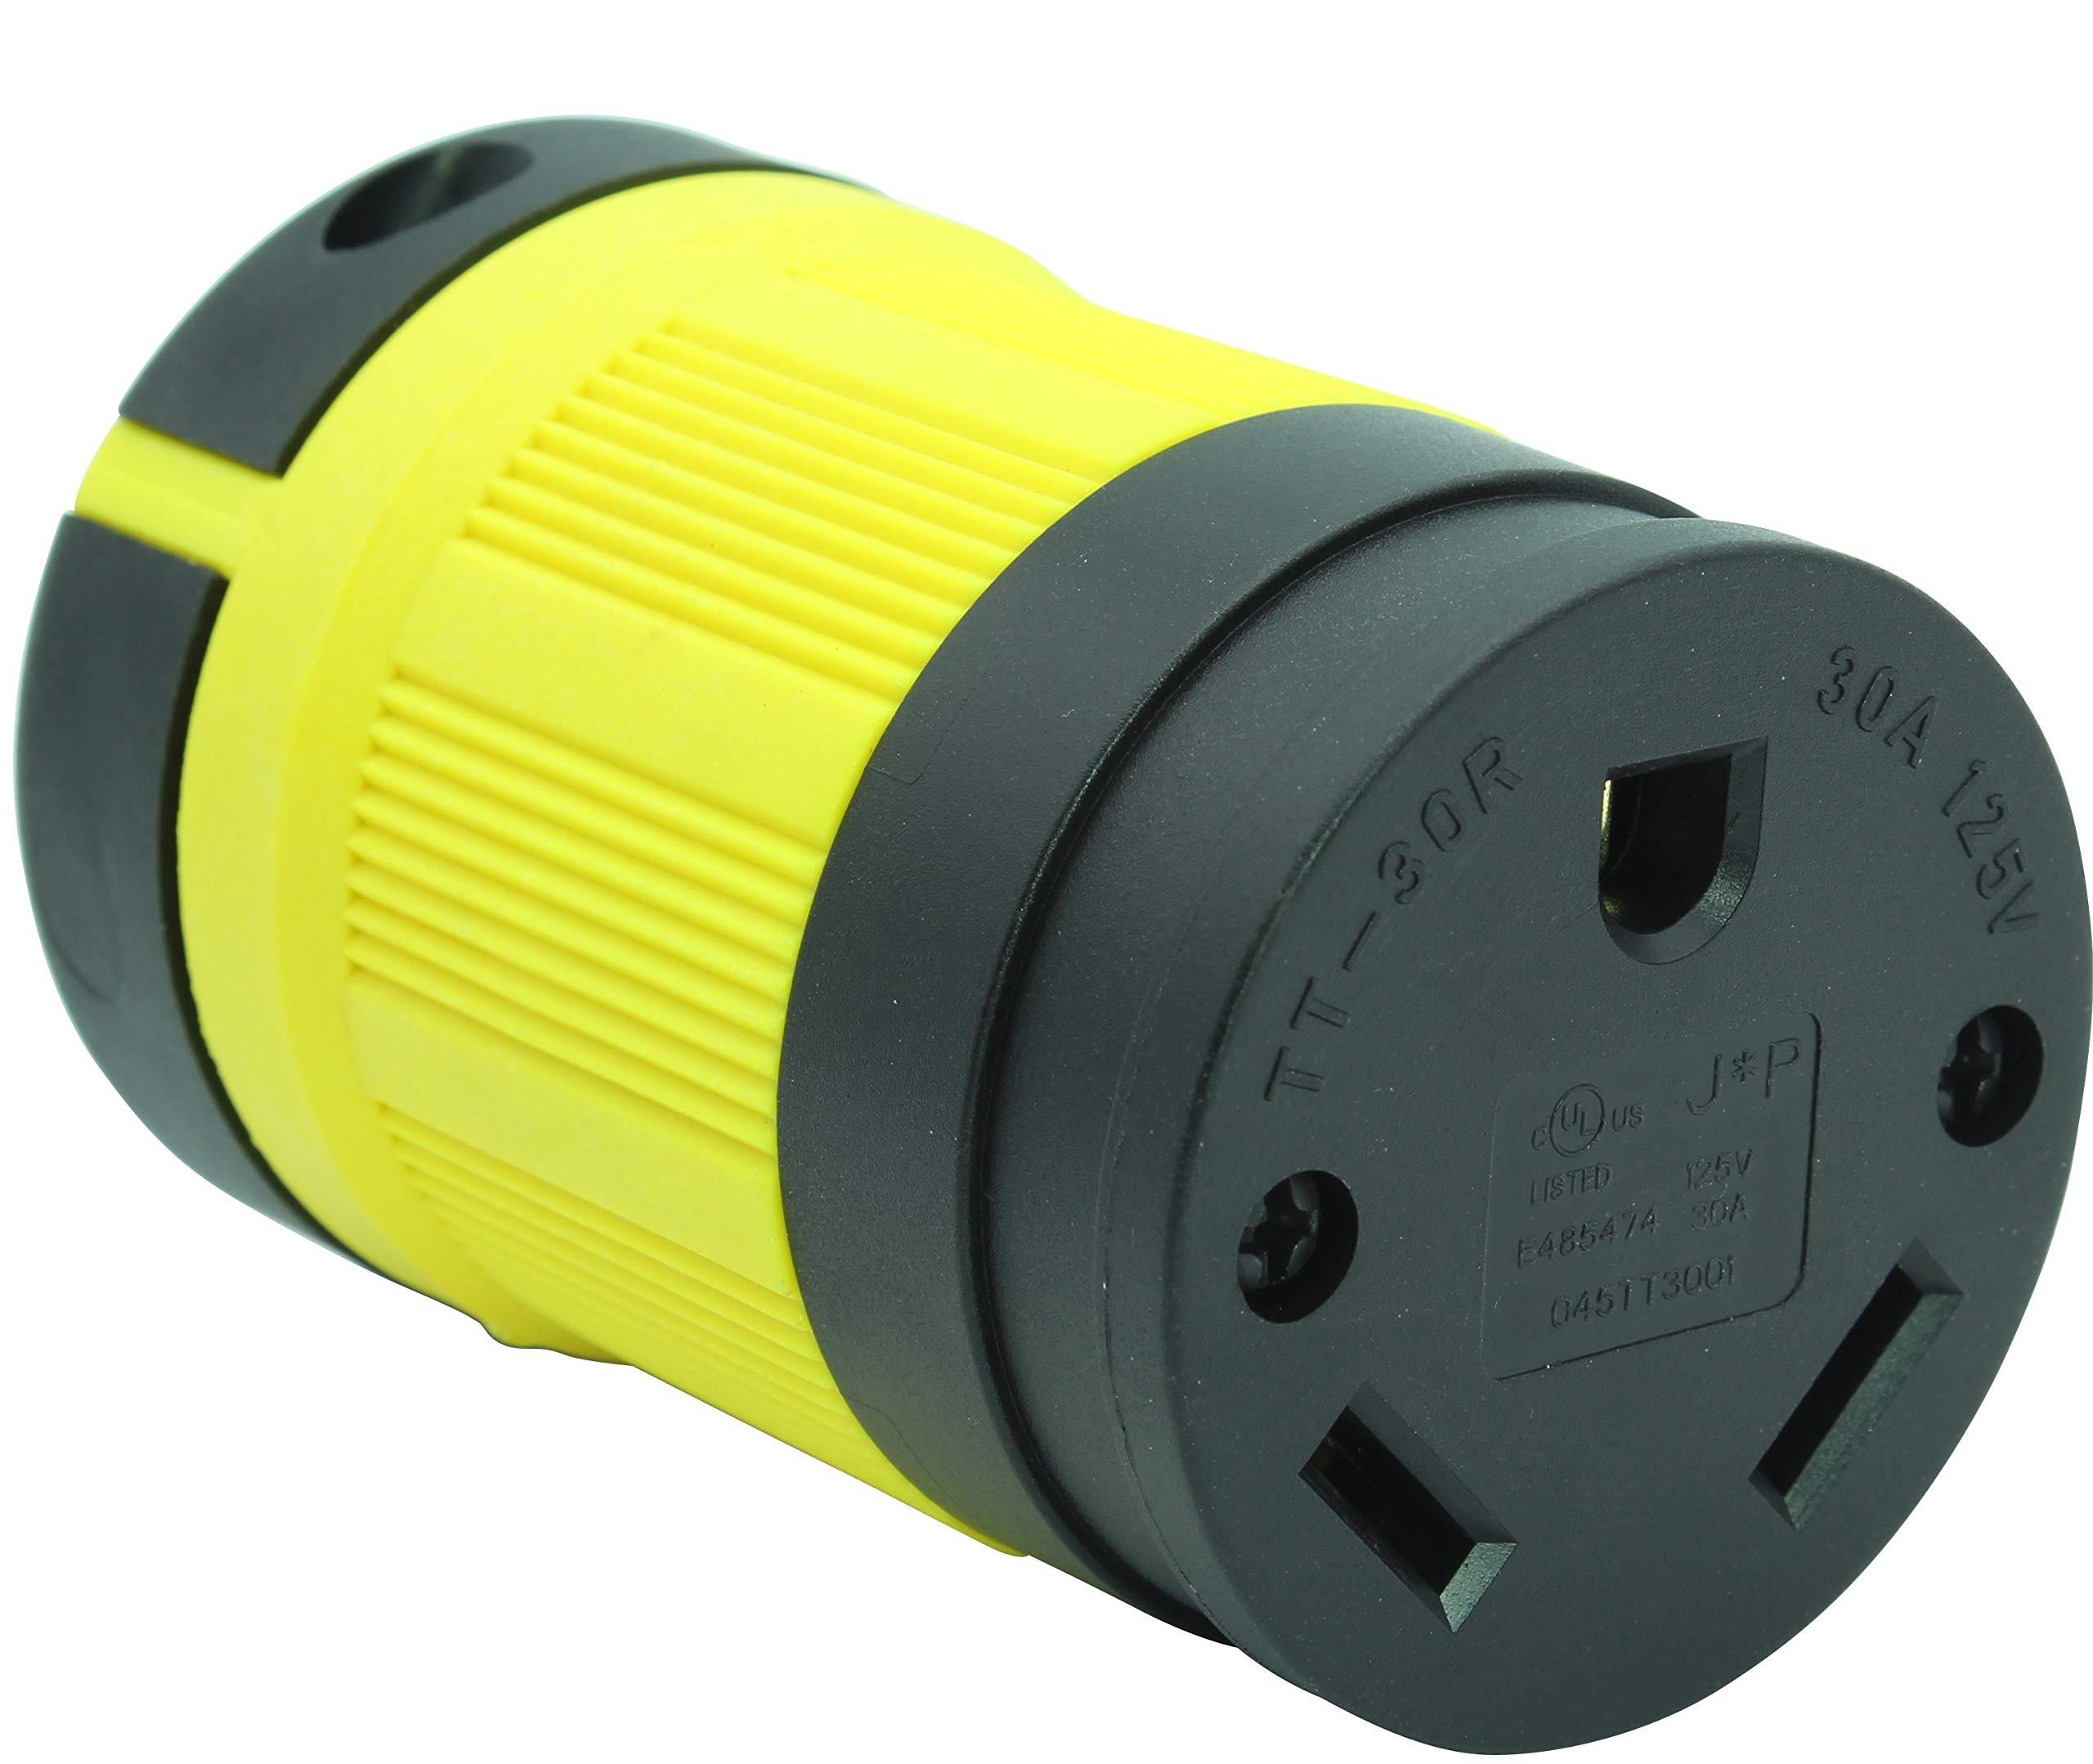 Journeyman-Pro NEMA TT-30R, 30 Amp, 125 Volt, Straight Blade Female RV Trailer Plug Connector, Black/Yellow Industrial Grade, Grounding 3750 Watts Generator TT30 (TT30R-YELLOW)